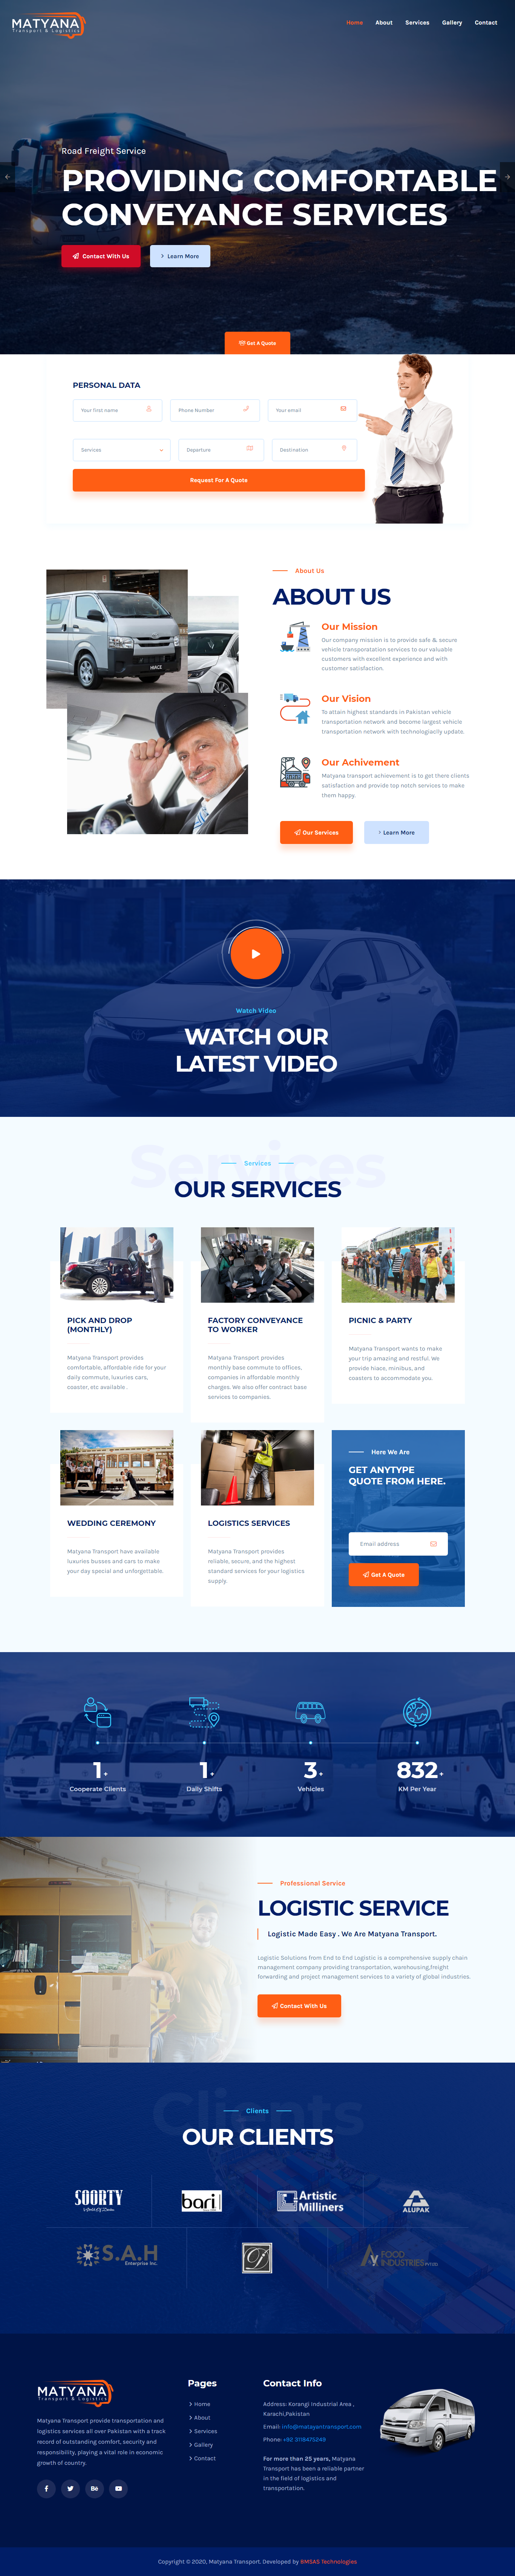 Matyana Transport portfolio image